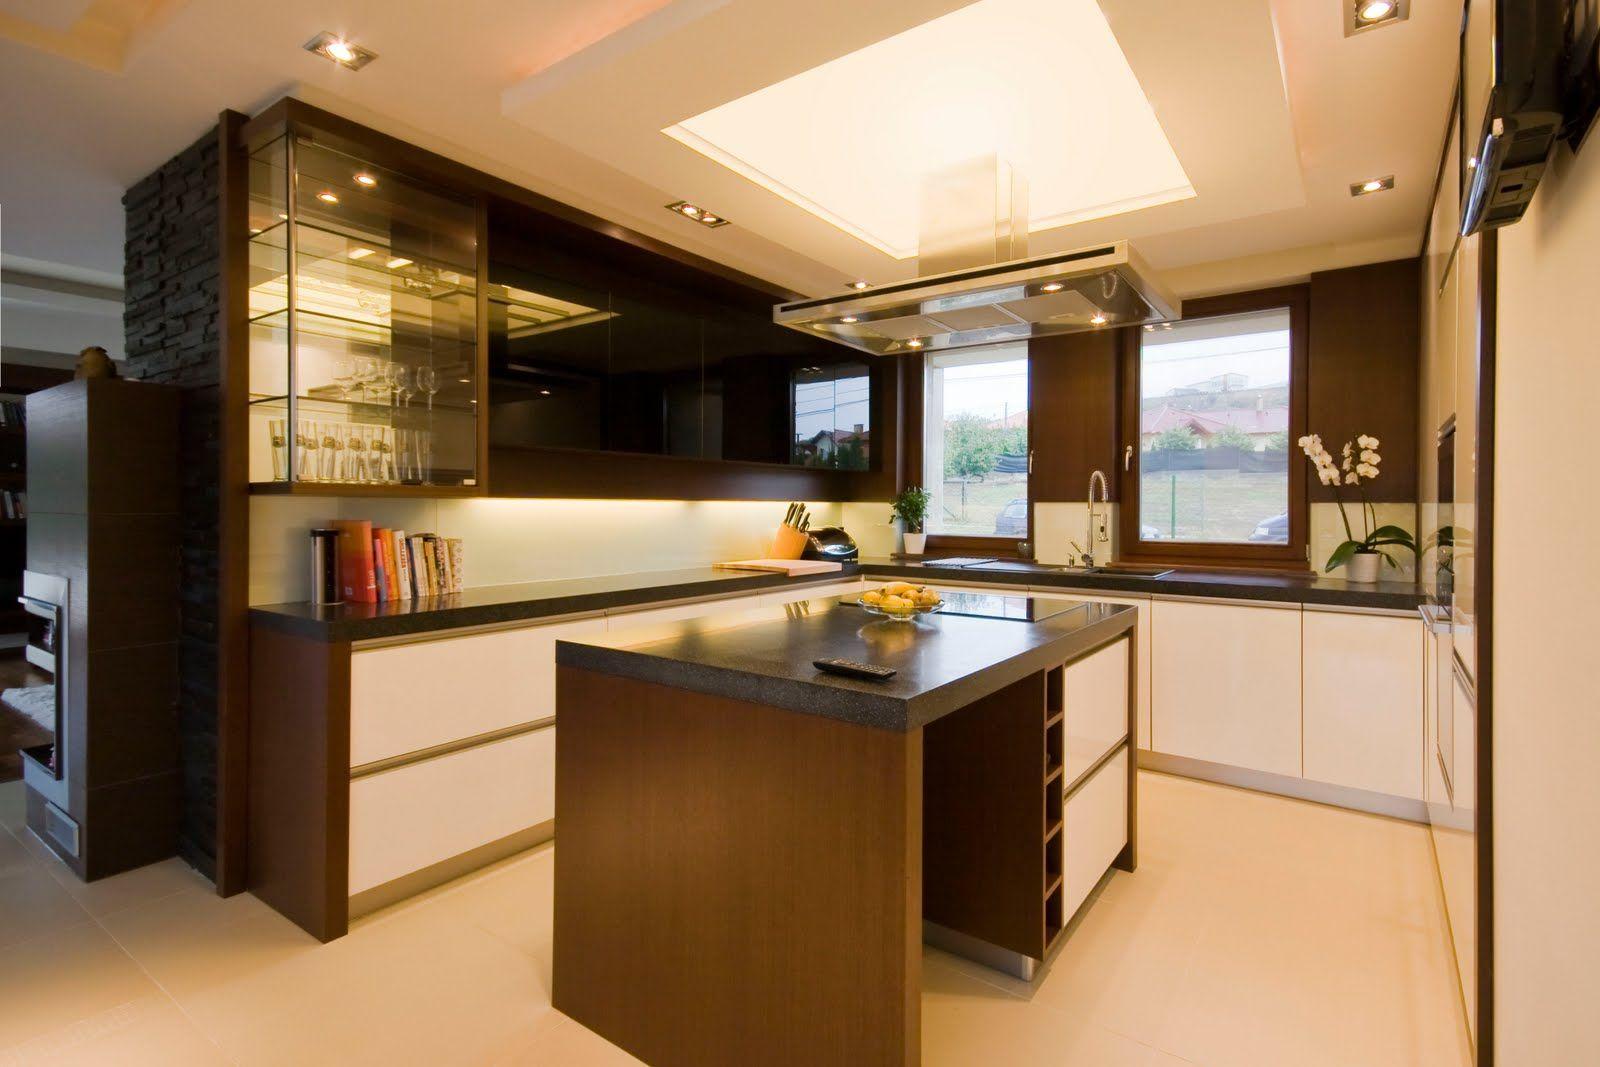 kitchen lighting designs. Collect Idea Strategic Kitchen Lighting. Design This Lighting I Designs